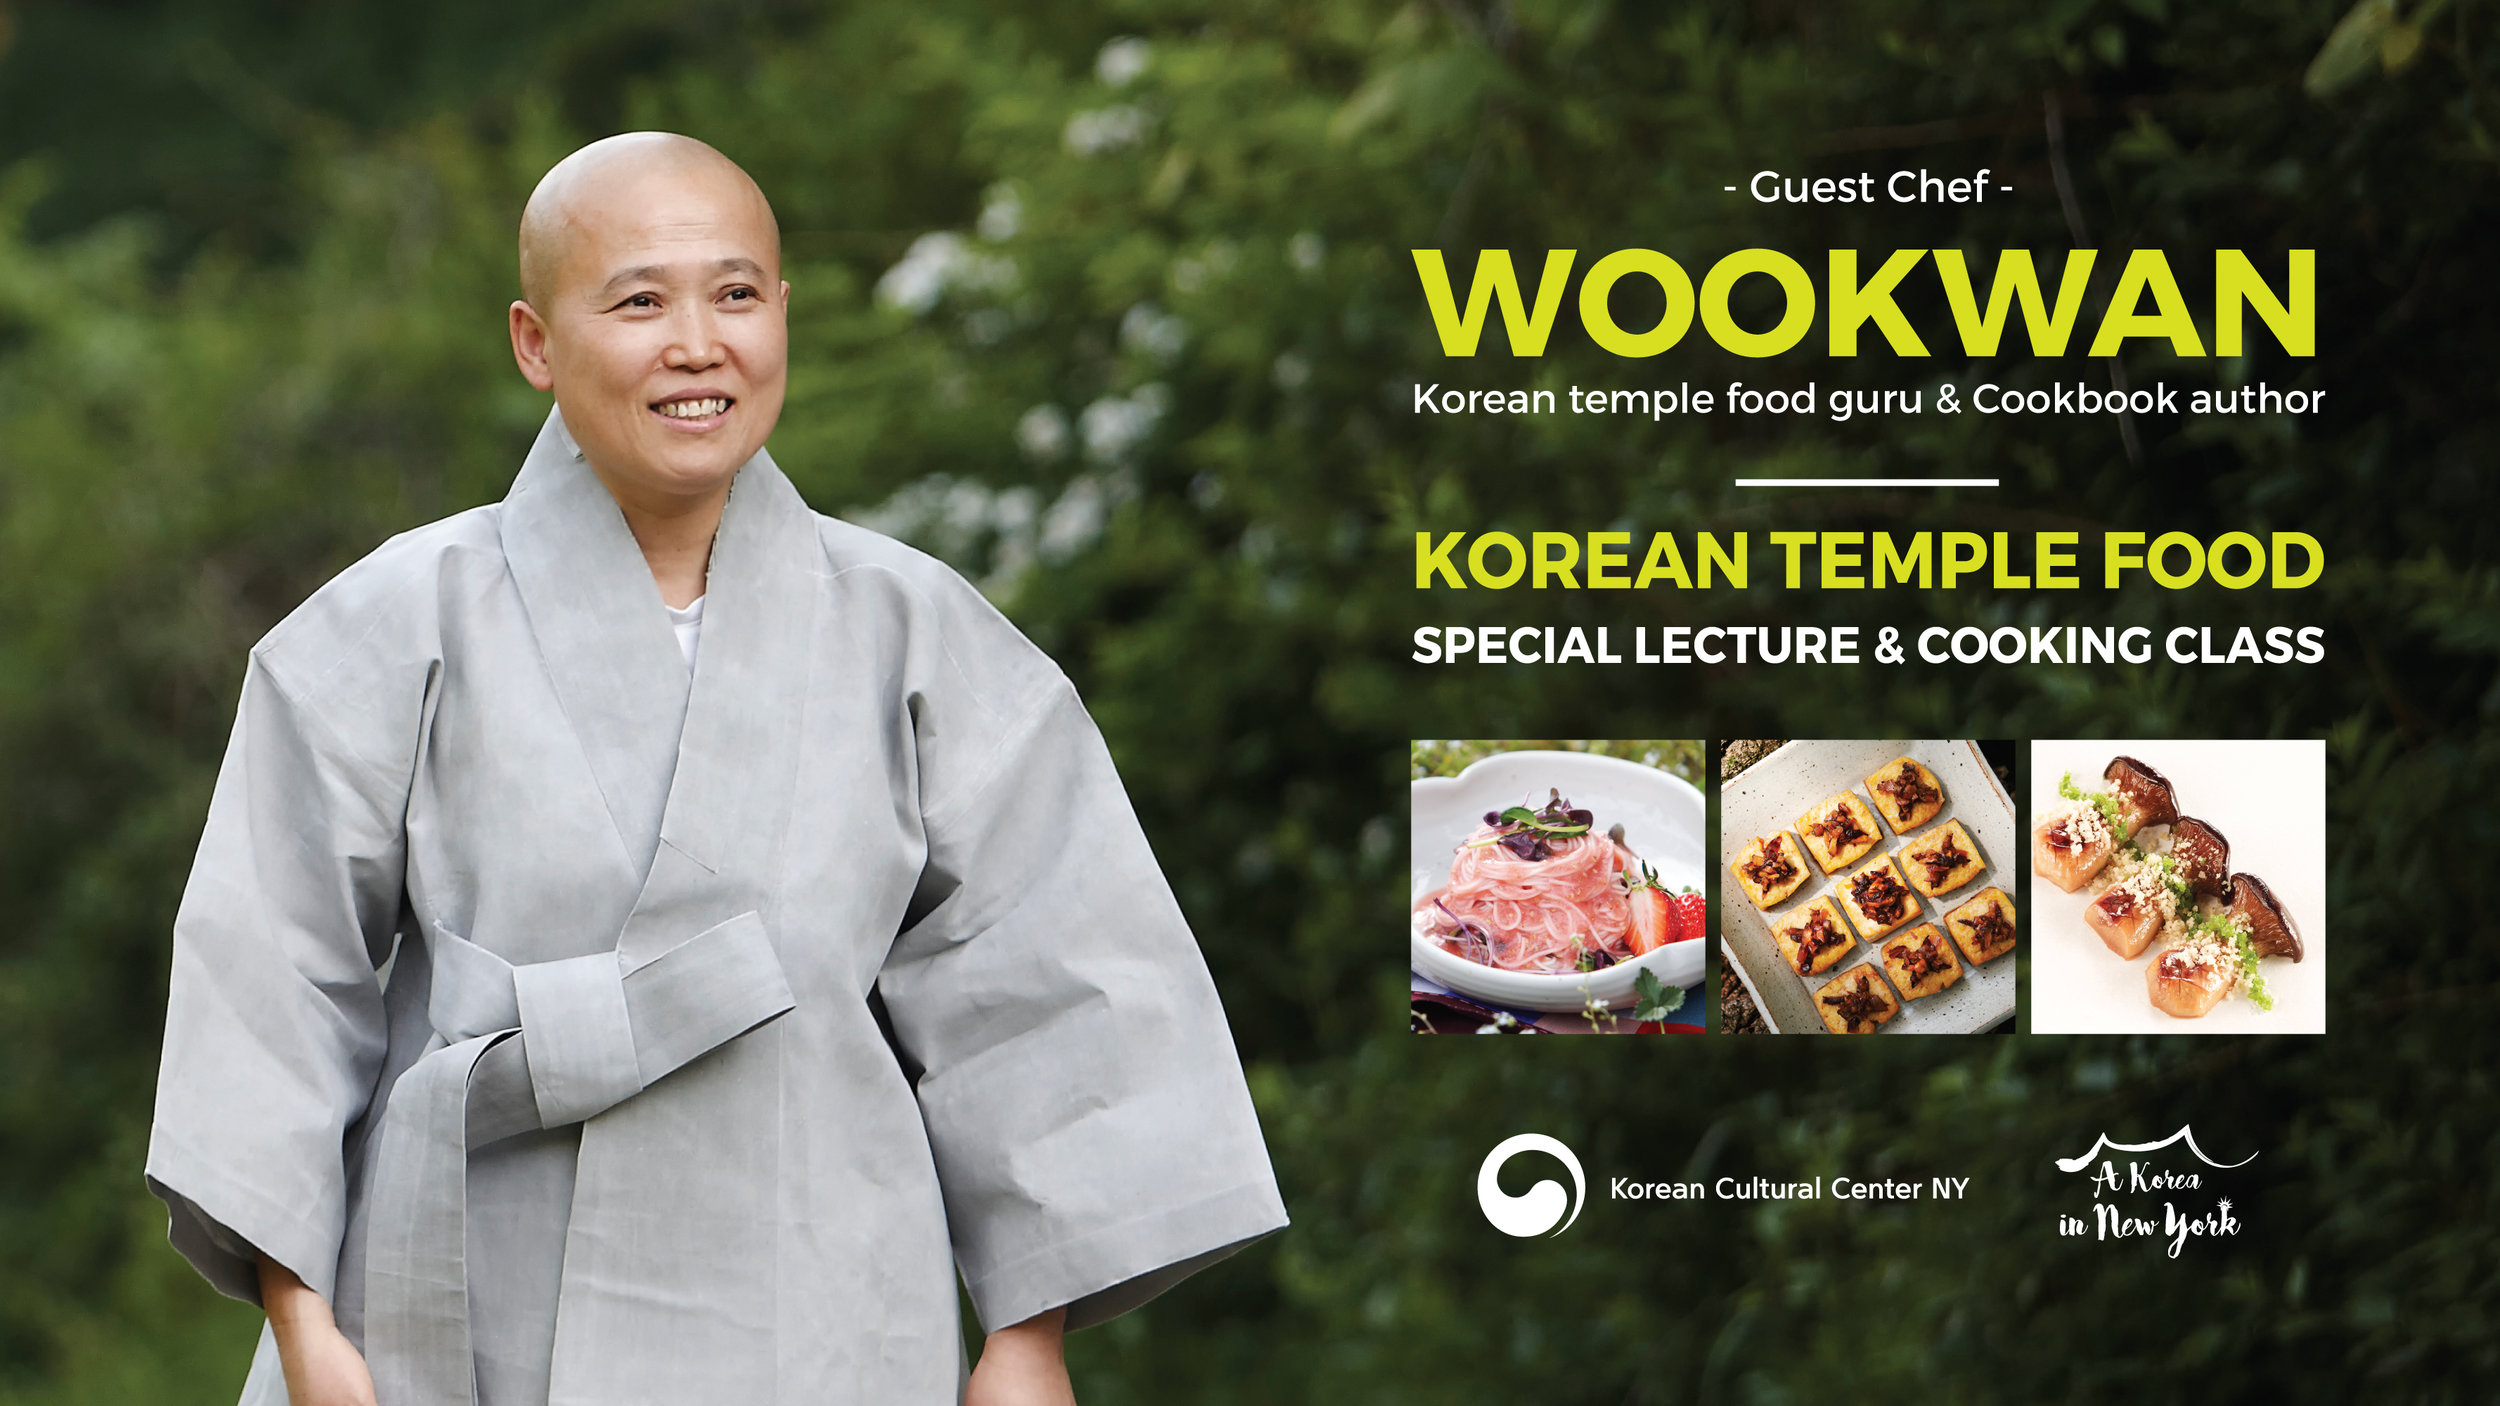 KCCNY_WookwanKTF_Large.jpg